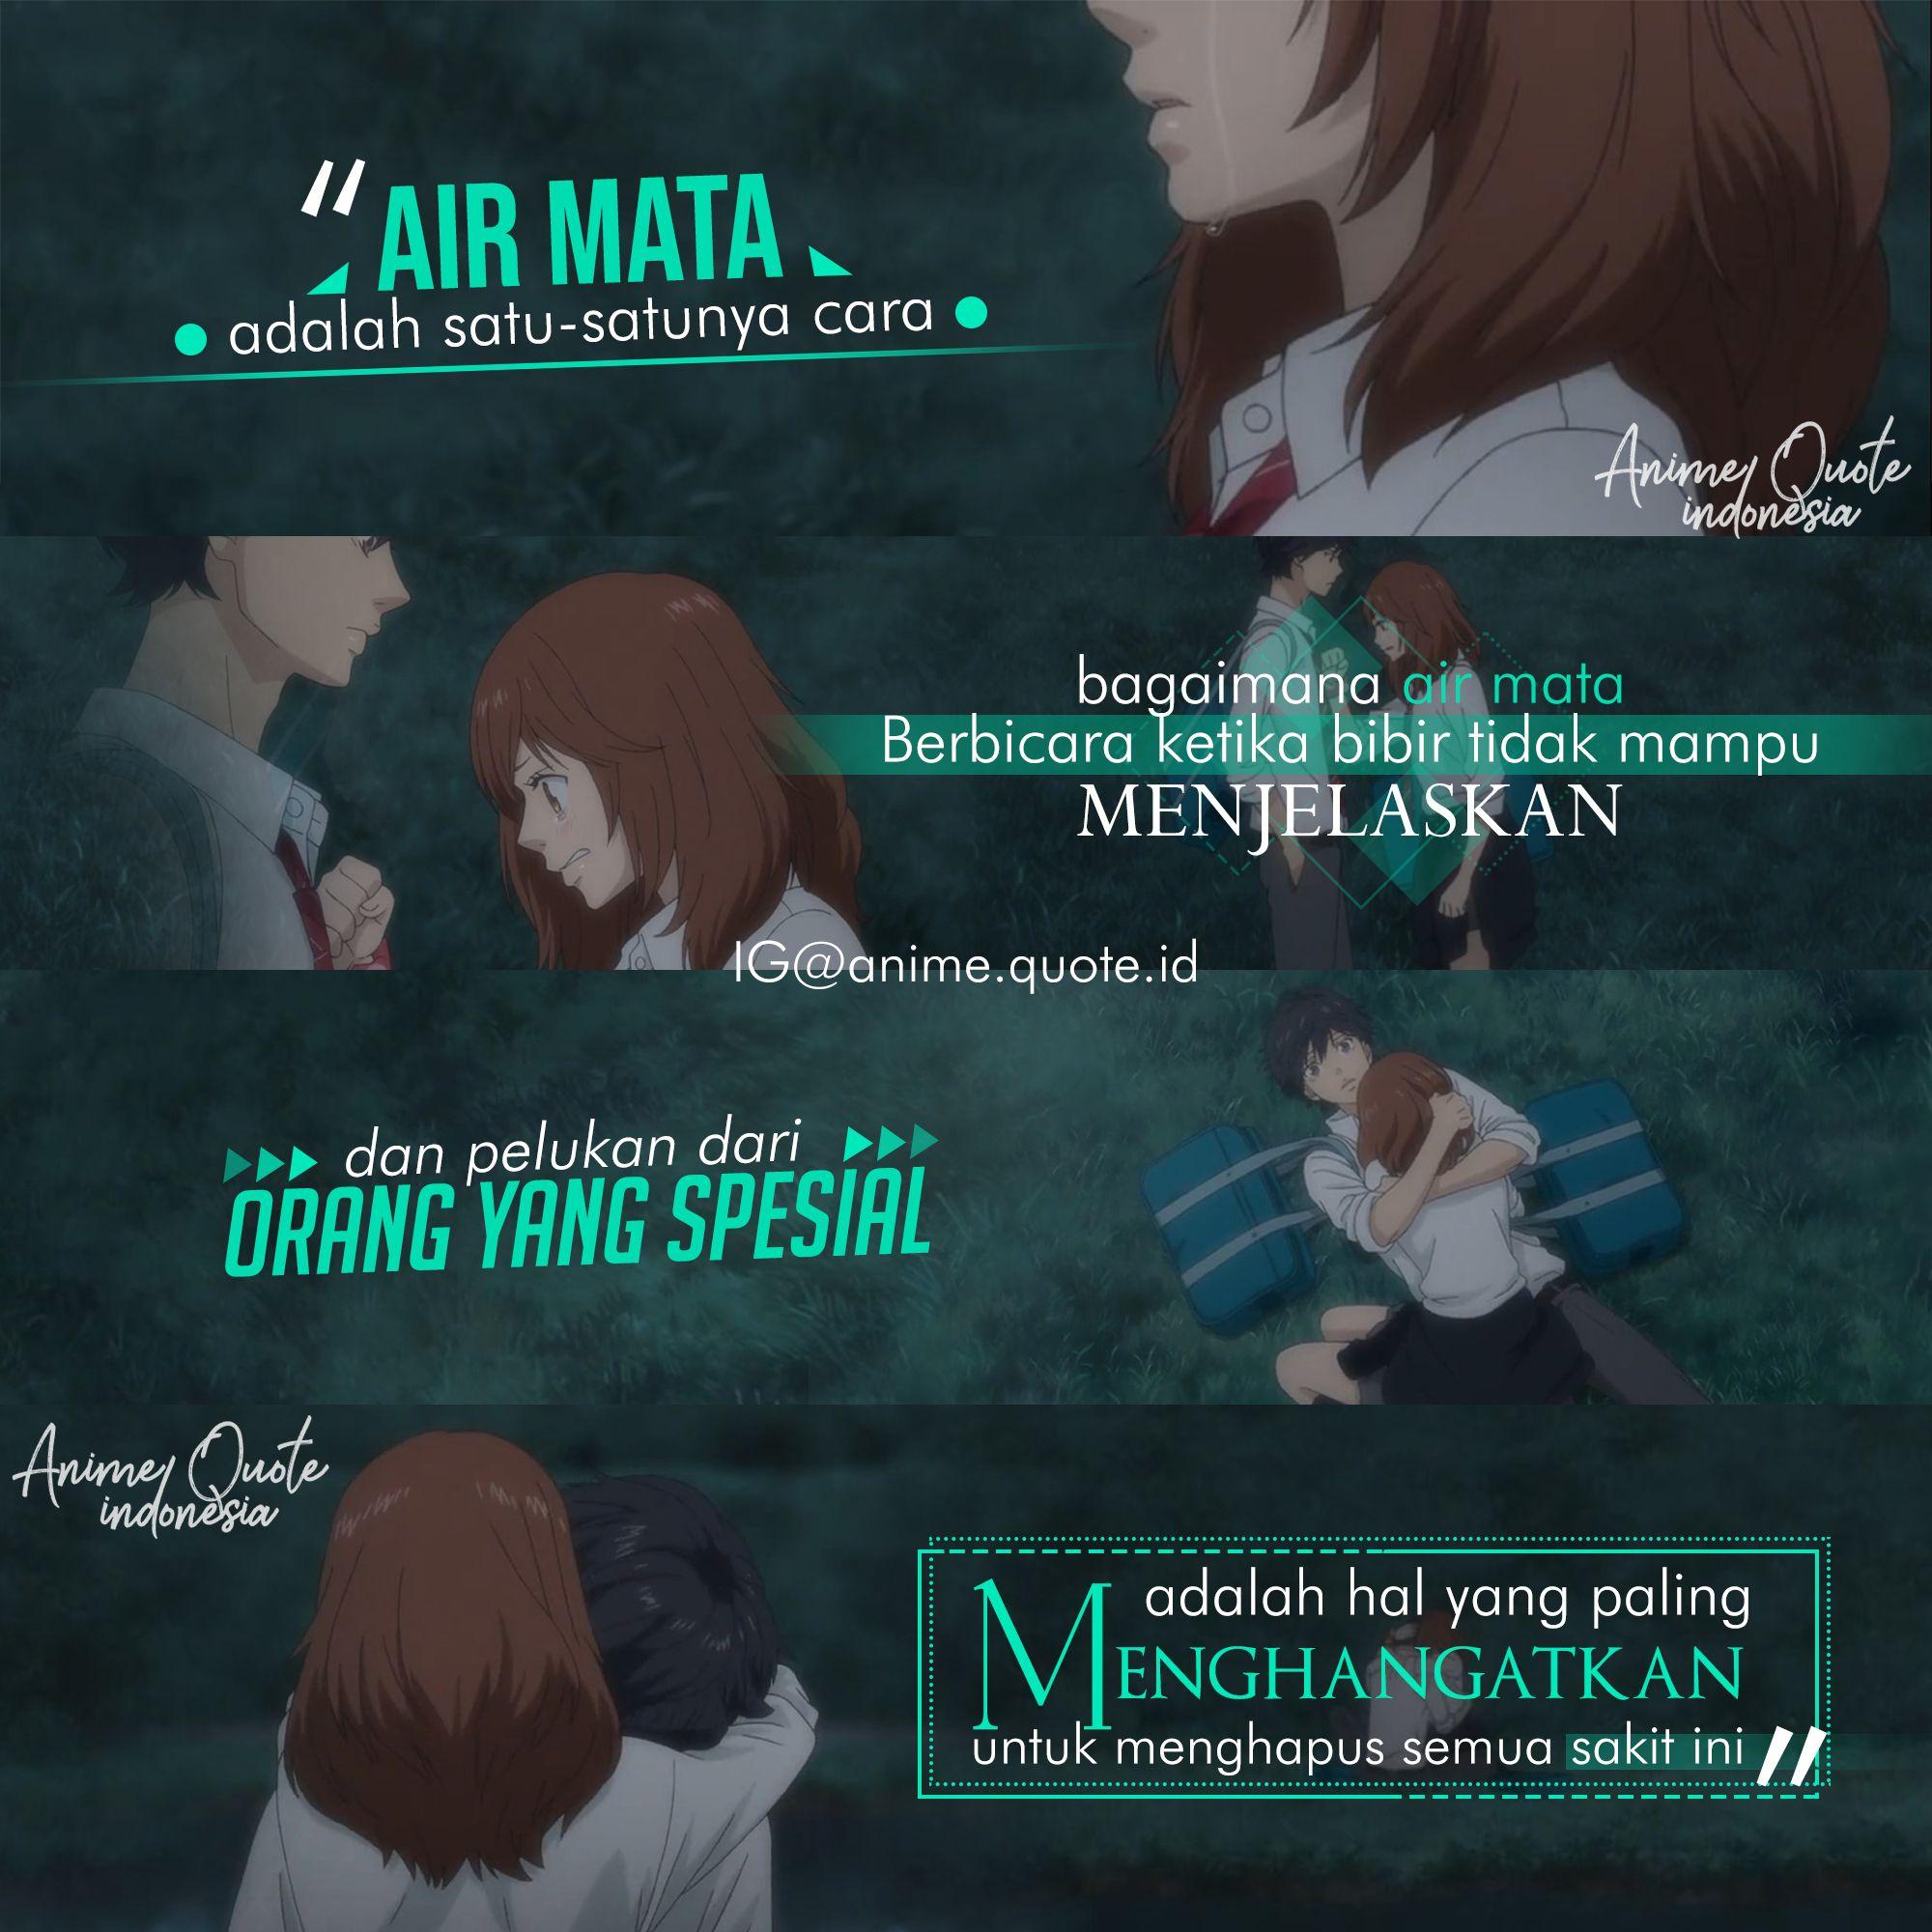 Anime Quote Indonesia di 2020 Pelukan, Orang, Indonesia